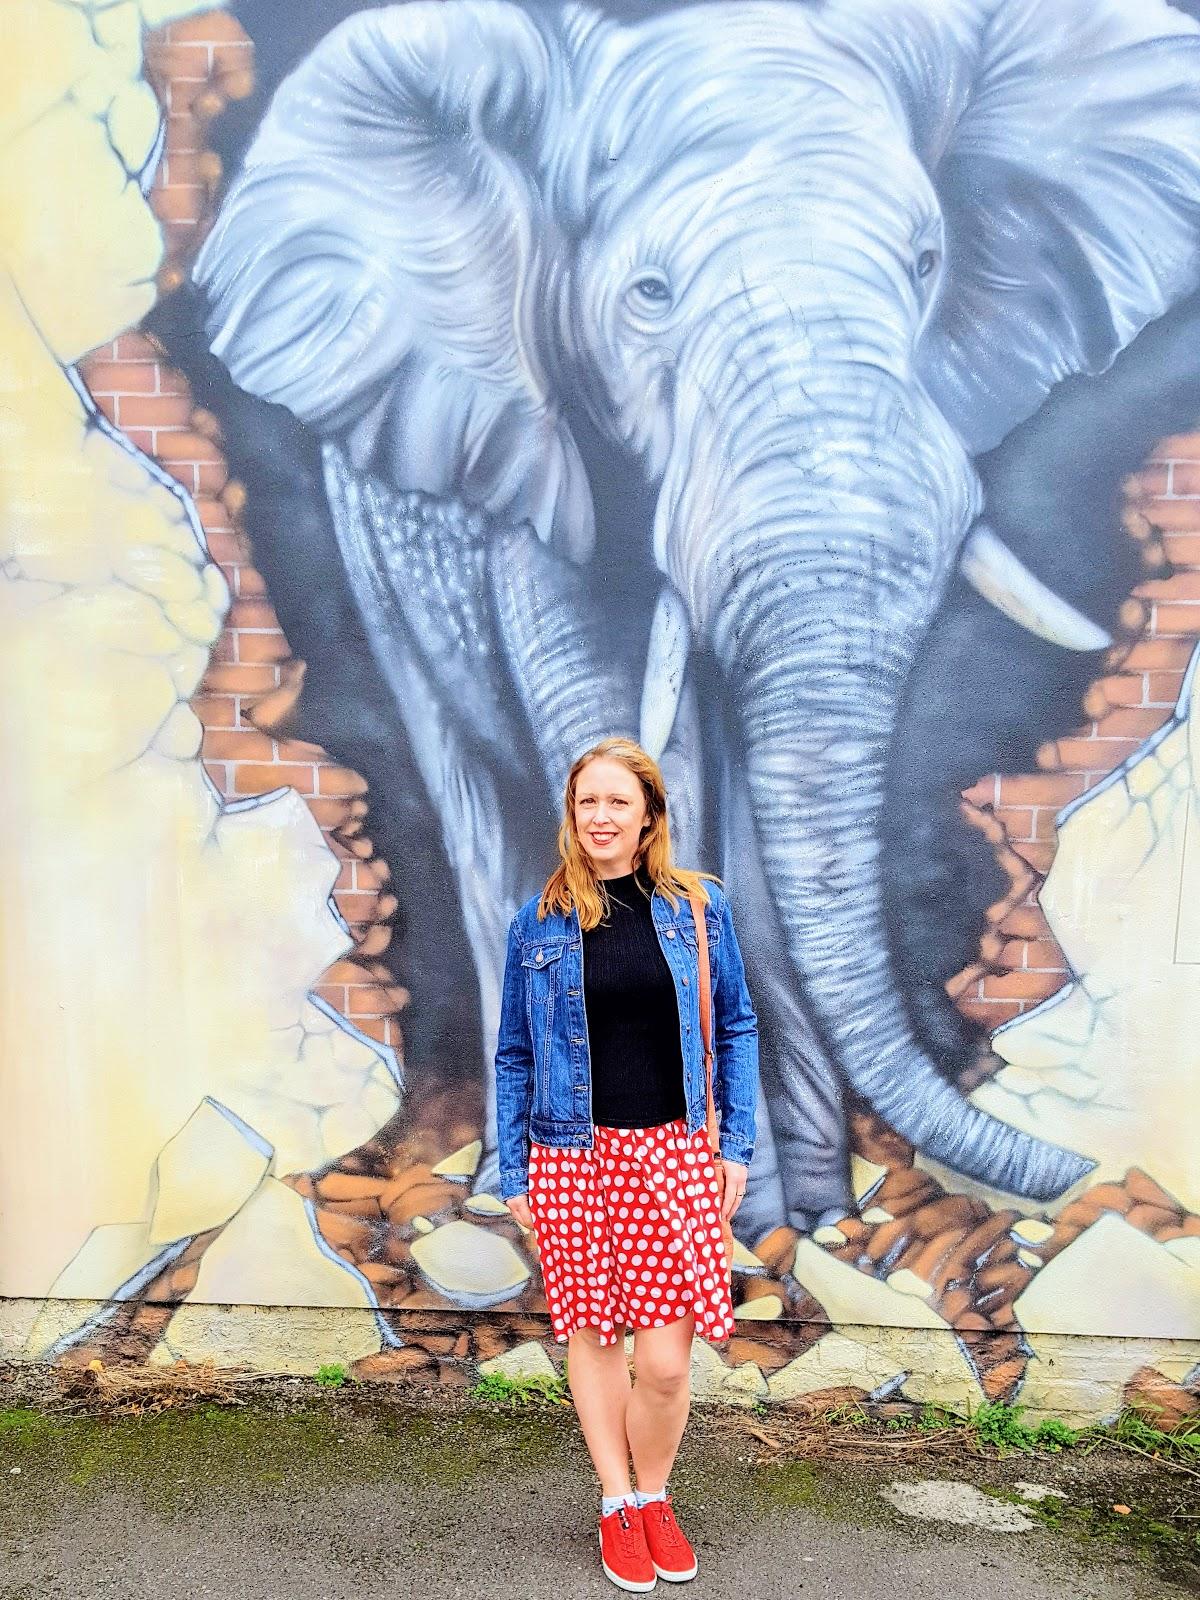 Giant Elephant Graffiti: Street Art In Loughborough